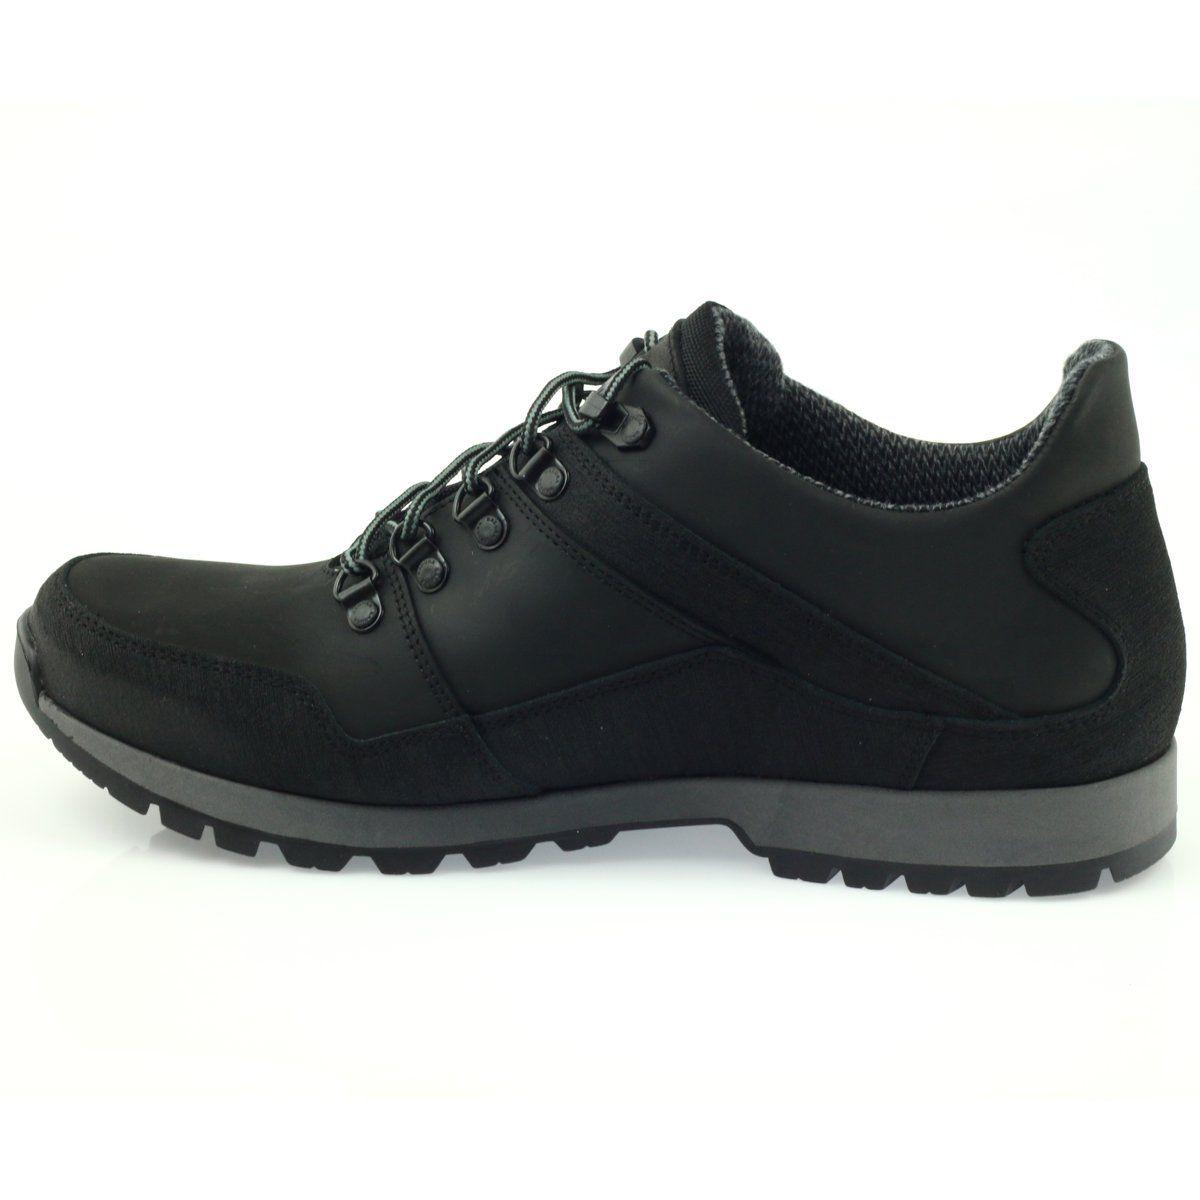 Trekkingi Z Membrana Sympatex Badura 3141 Czarne All Black Sneakers Sneakers Shoes